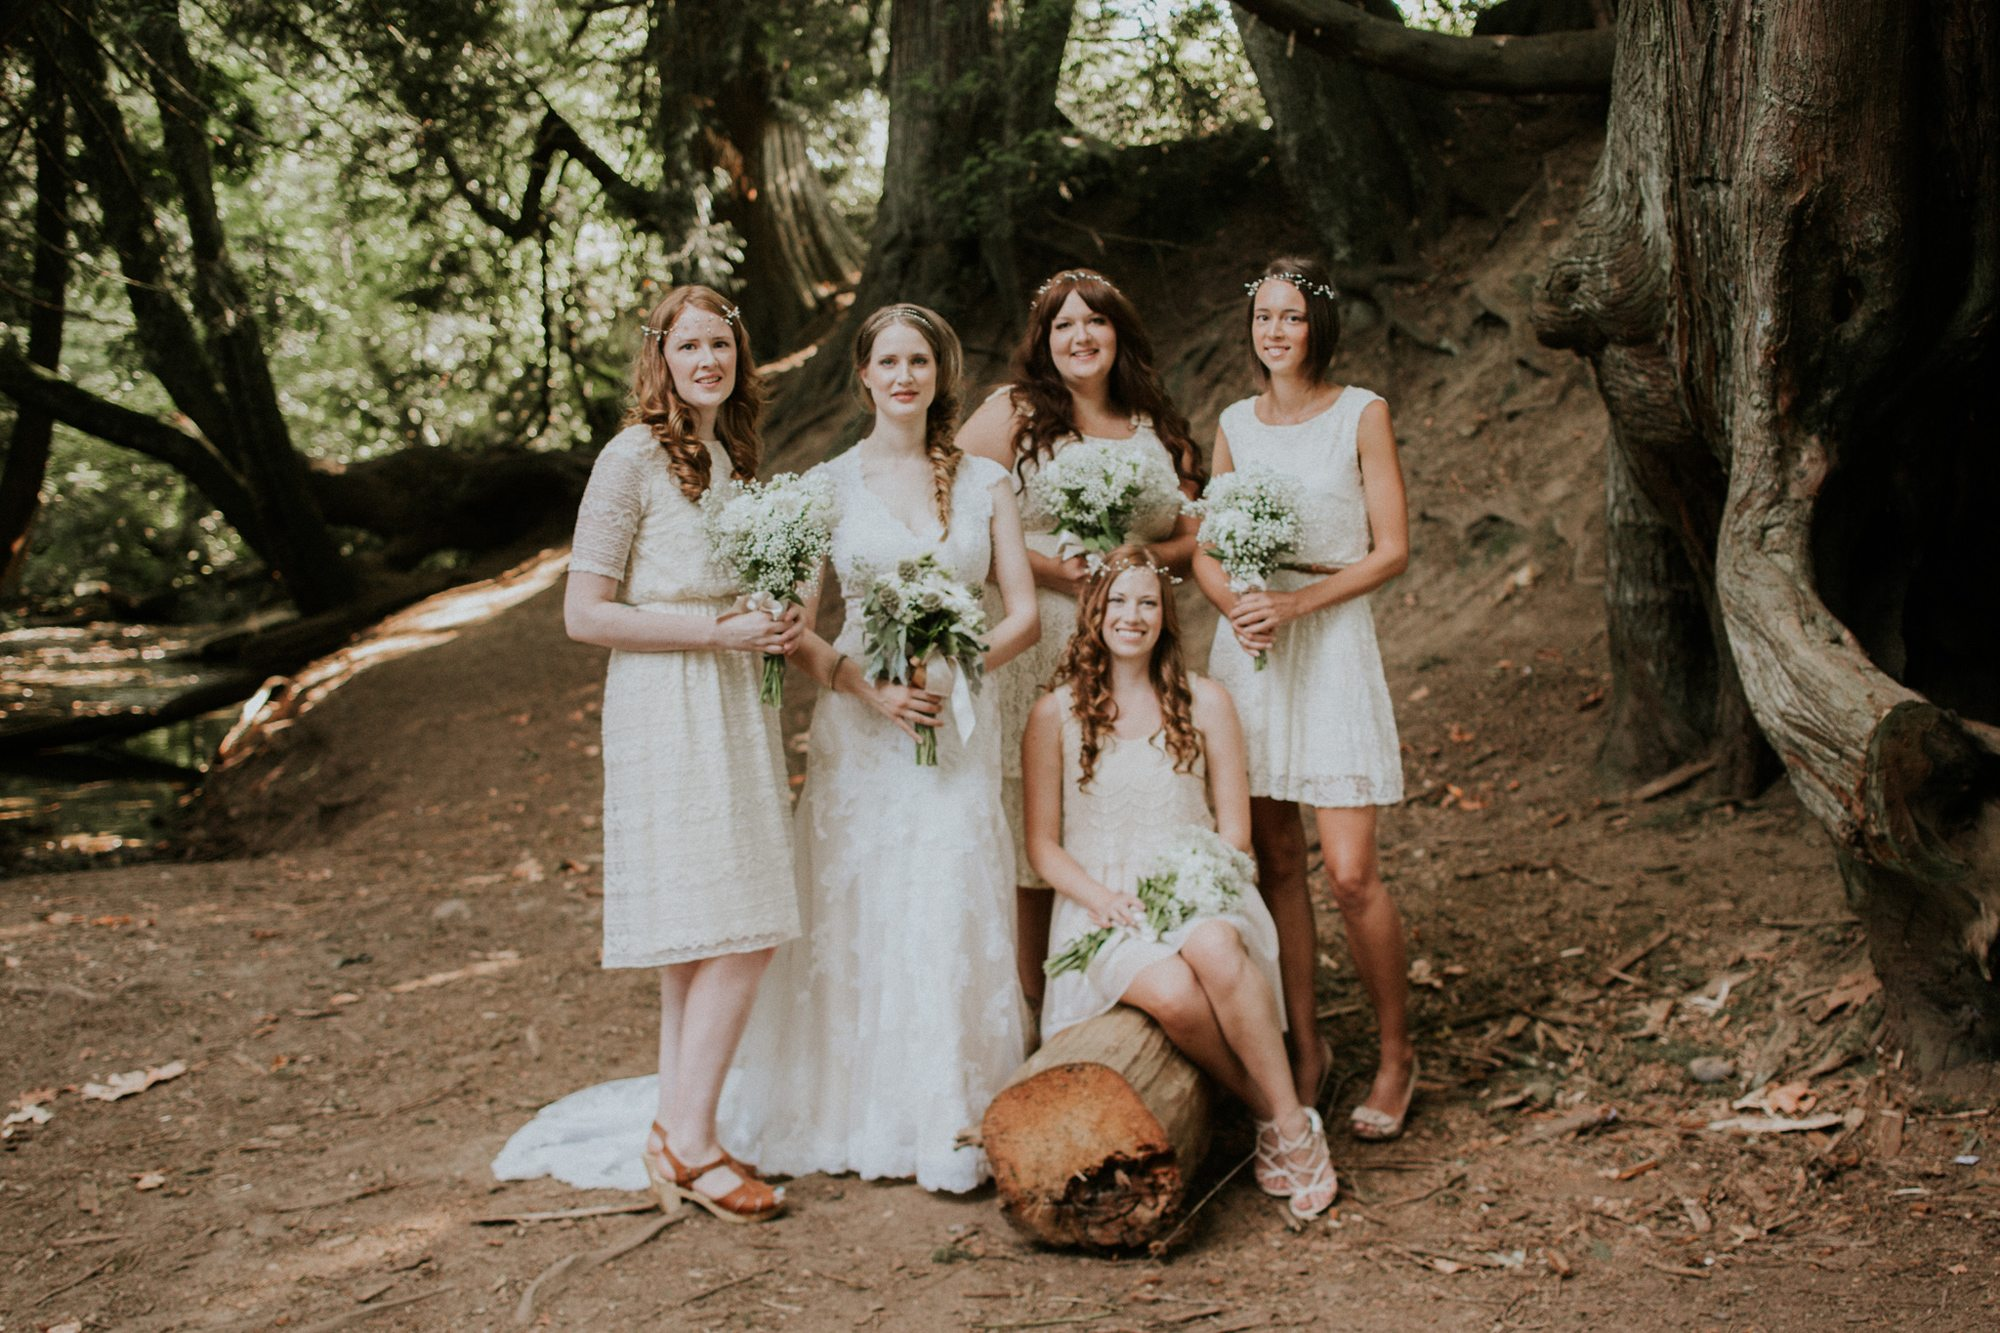 853-abbotsford-wedding-photographer